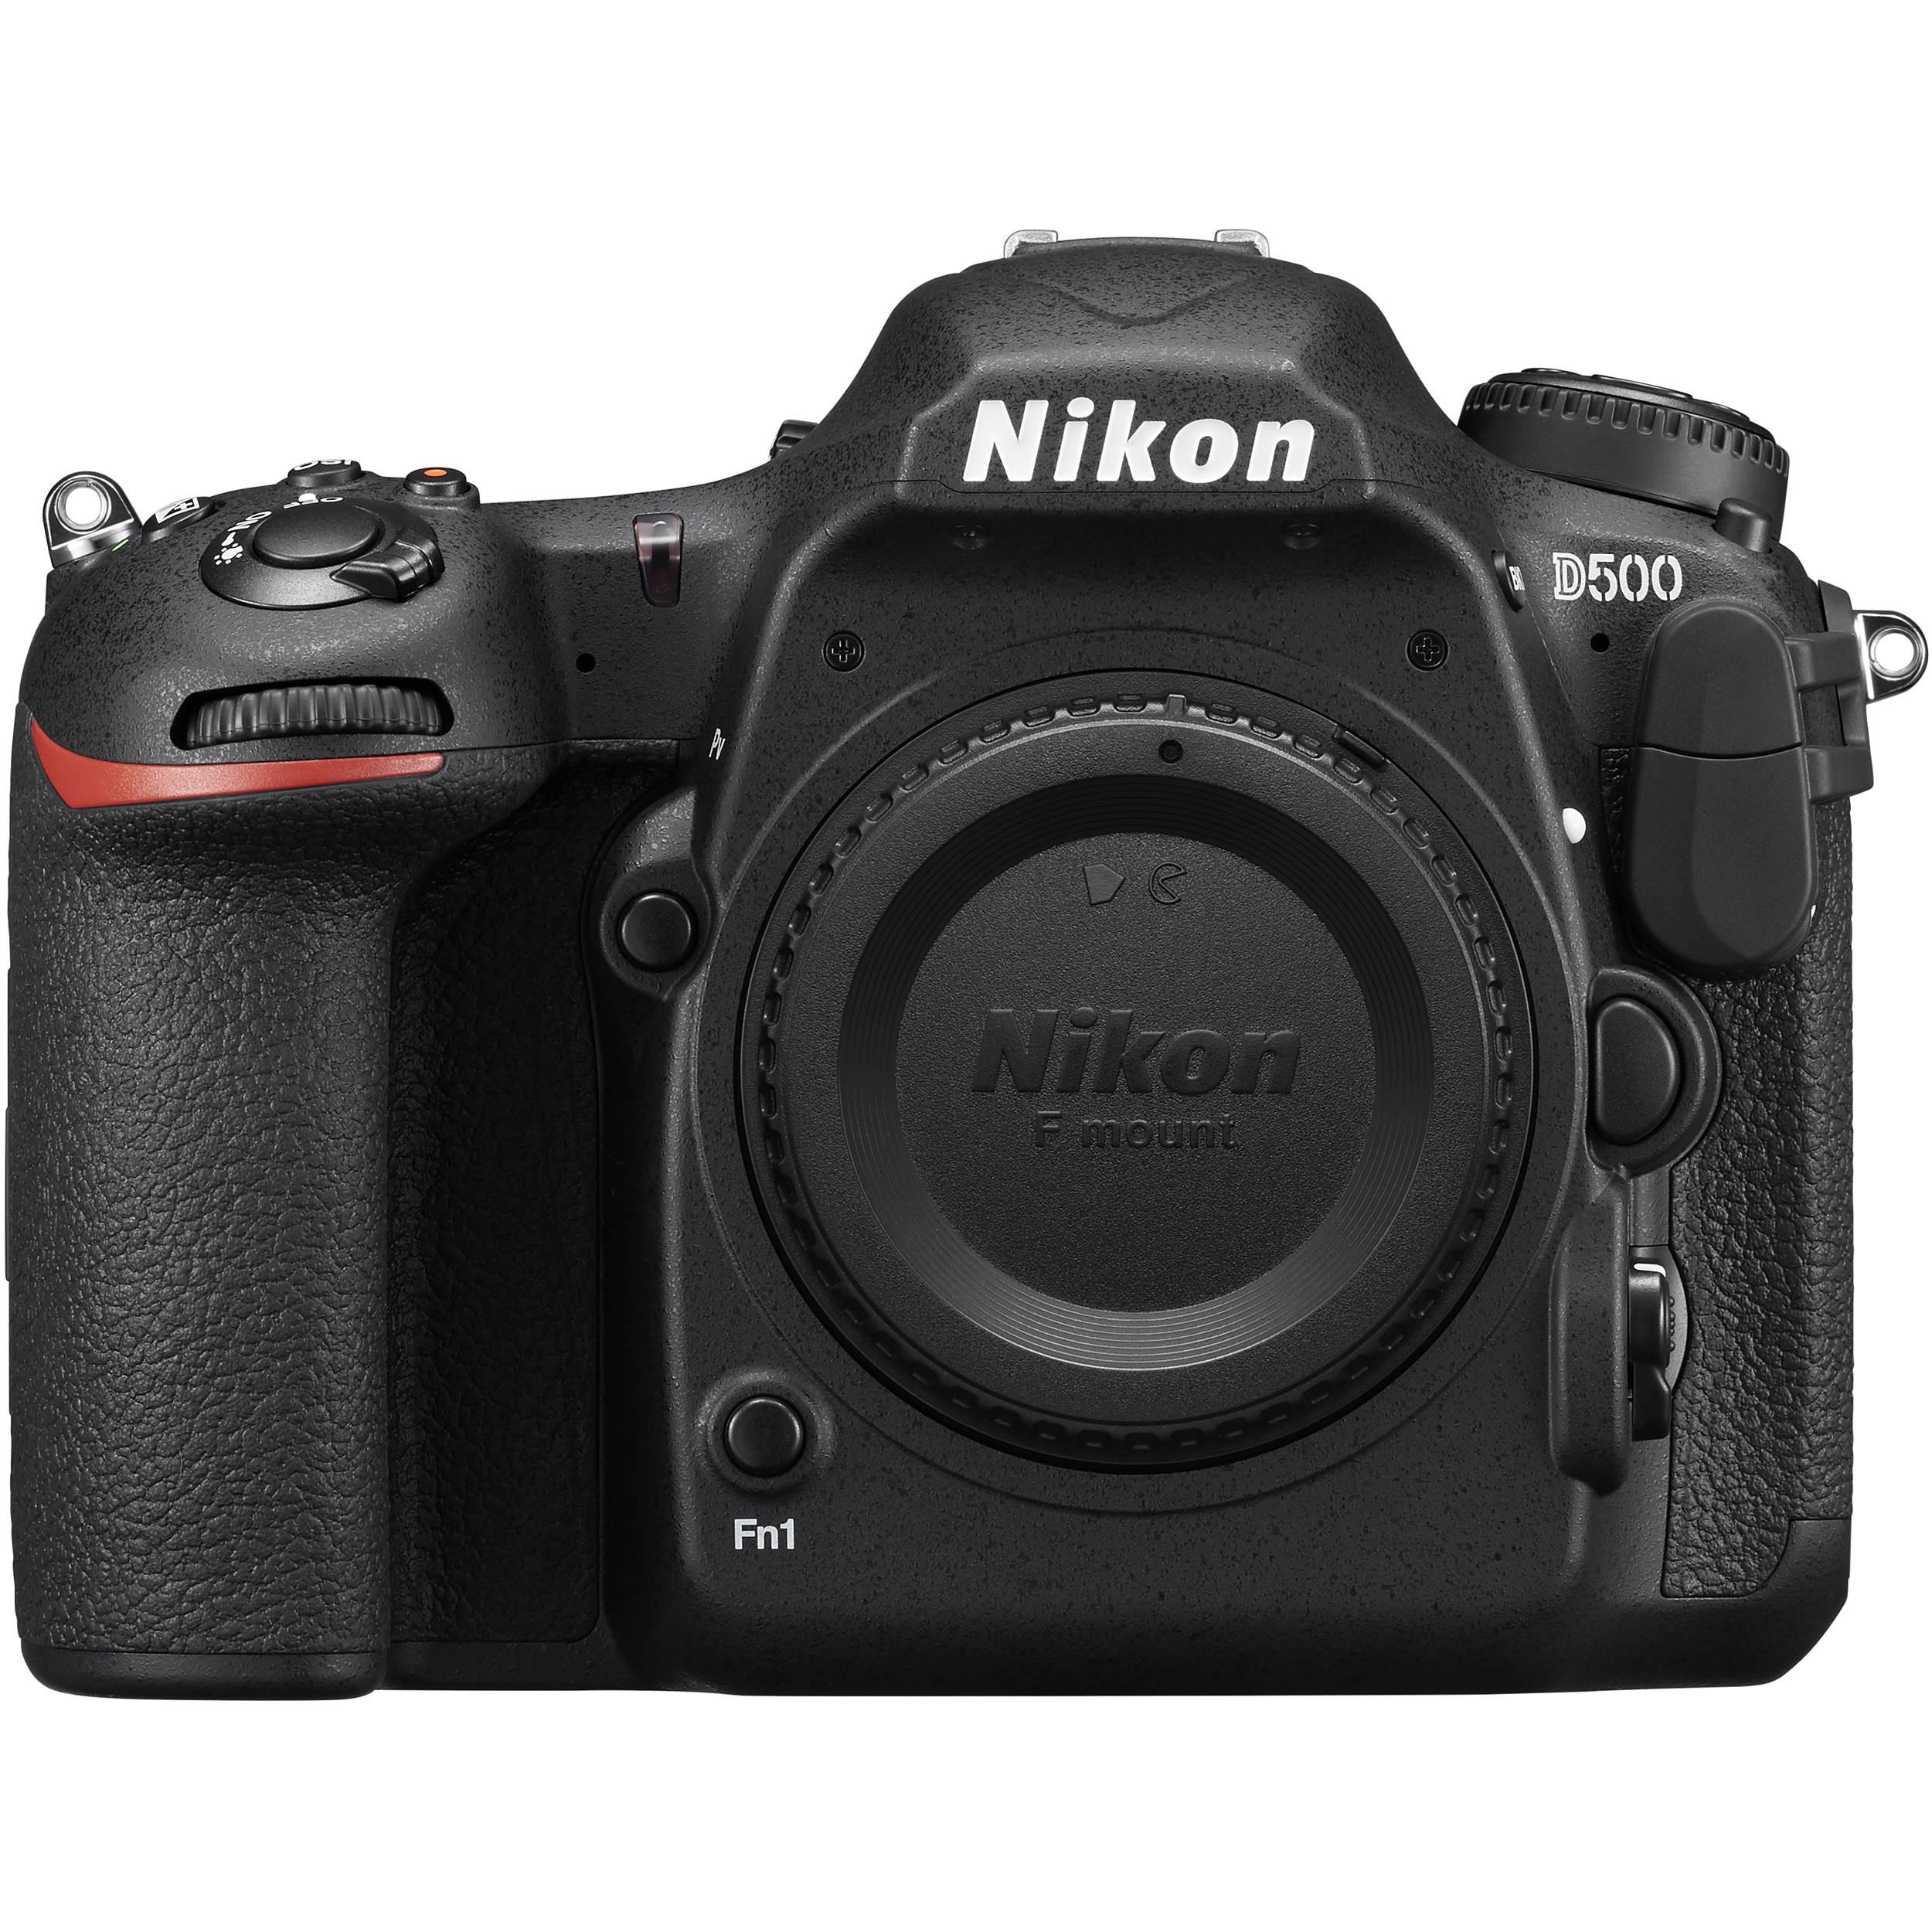 Camera Nikon Dslr Camera Range nikon dslr cameras digital slr bh d500 camera body only